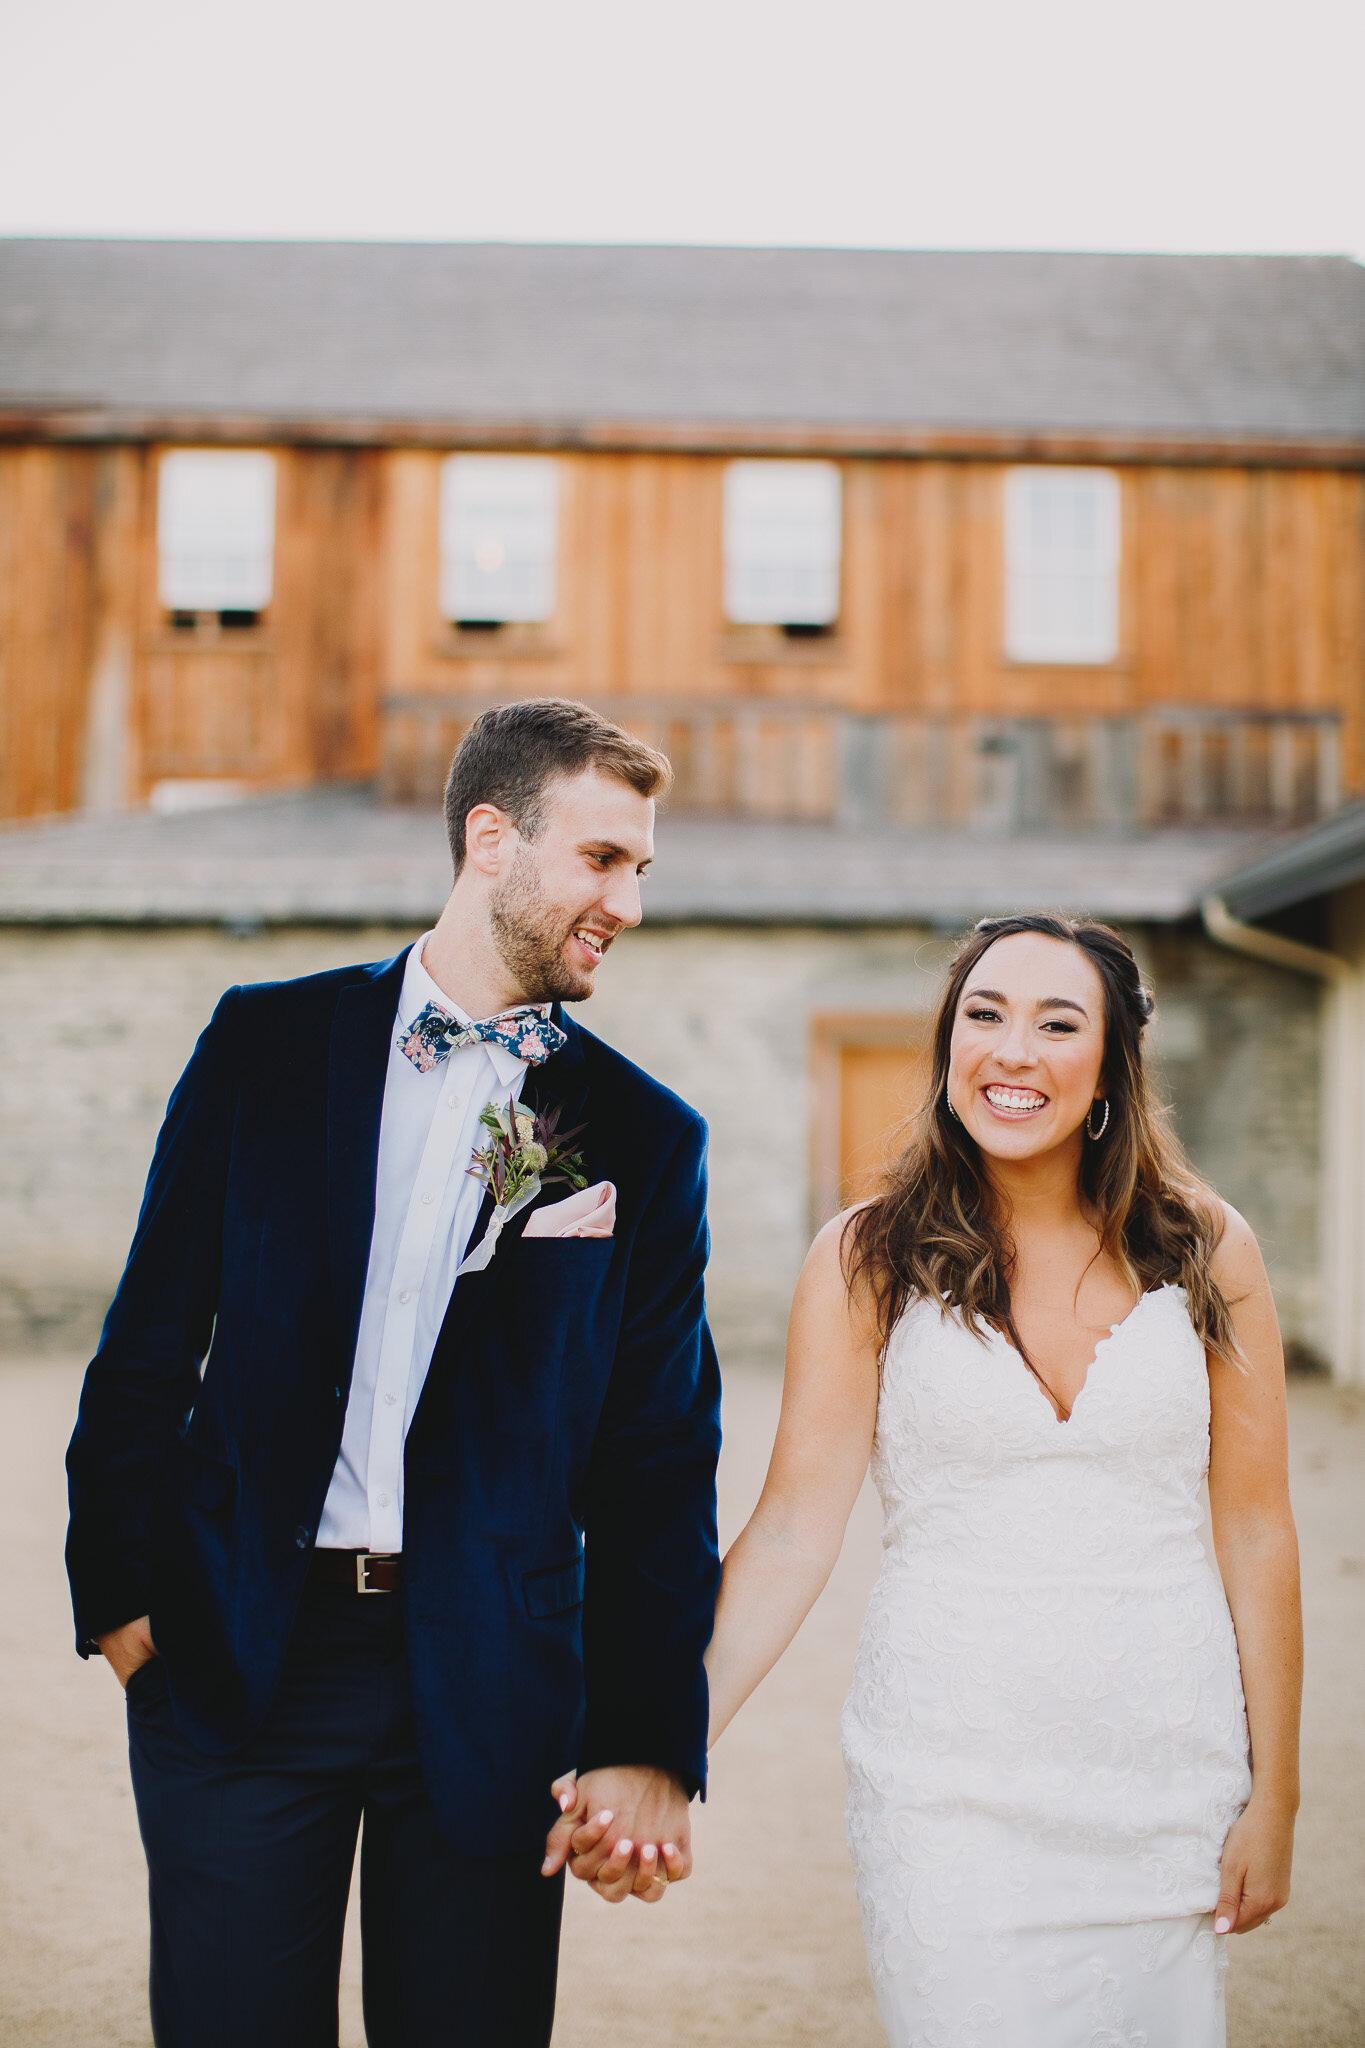 Archer Inspired Photography - Monica and Chris - Monterey CA Wedding-5.jpg